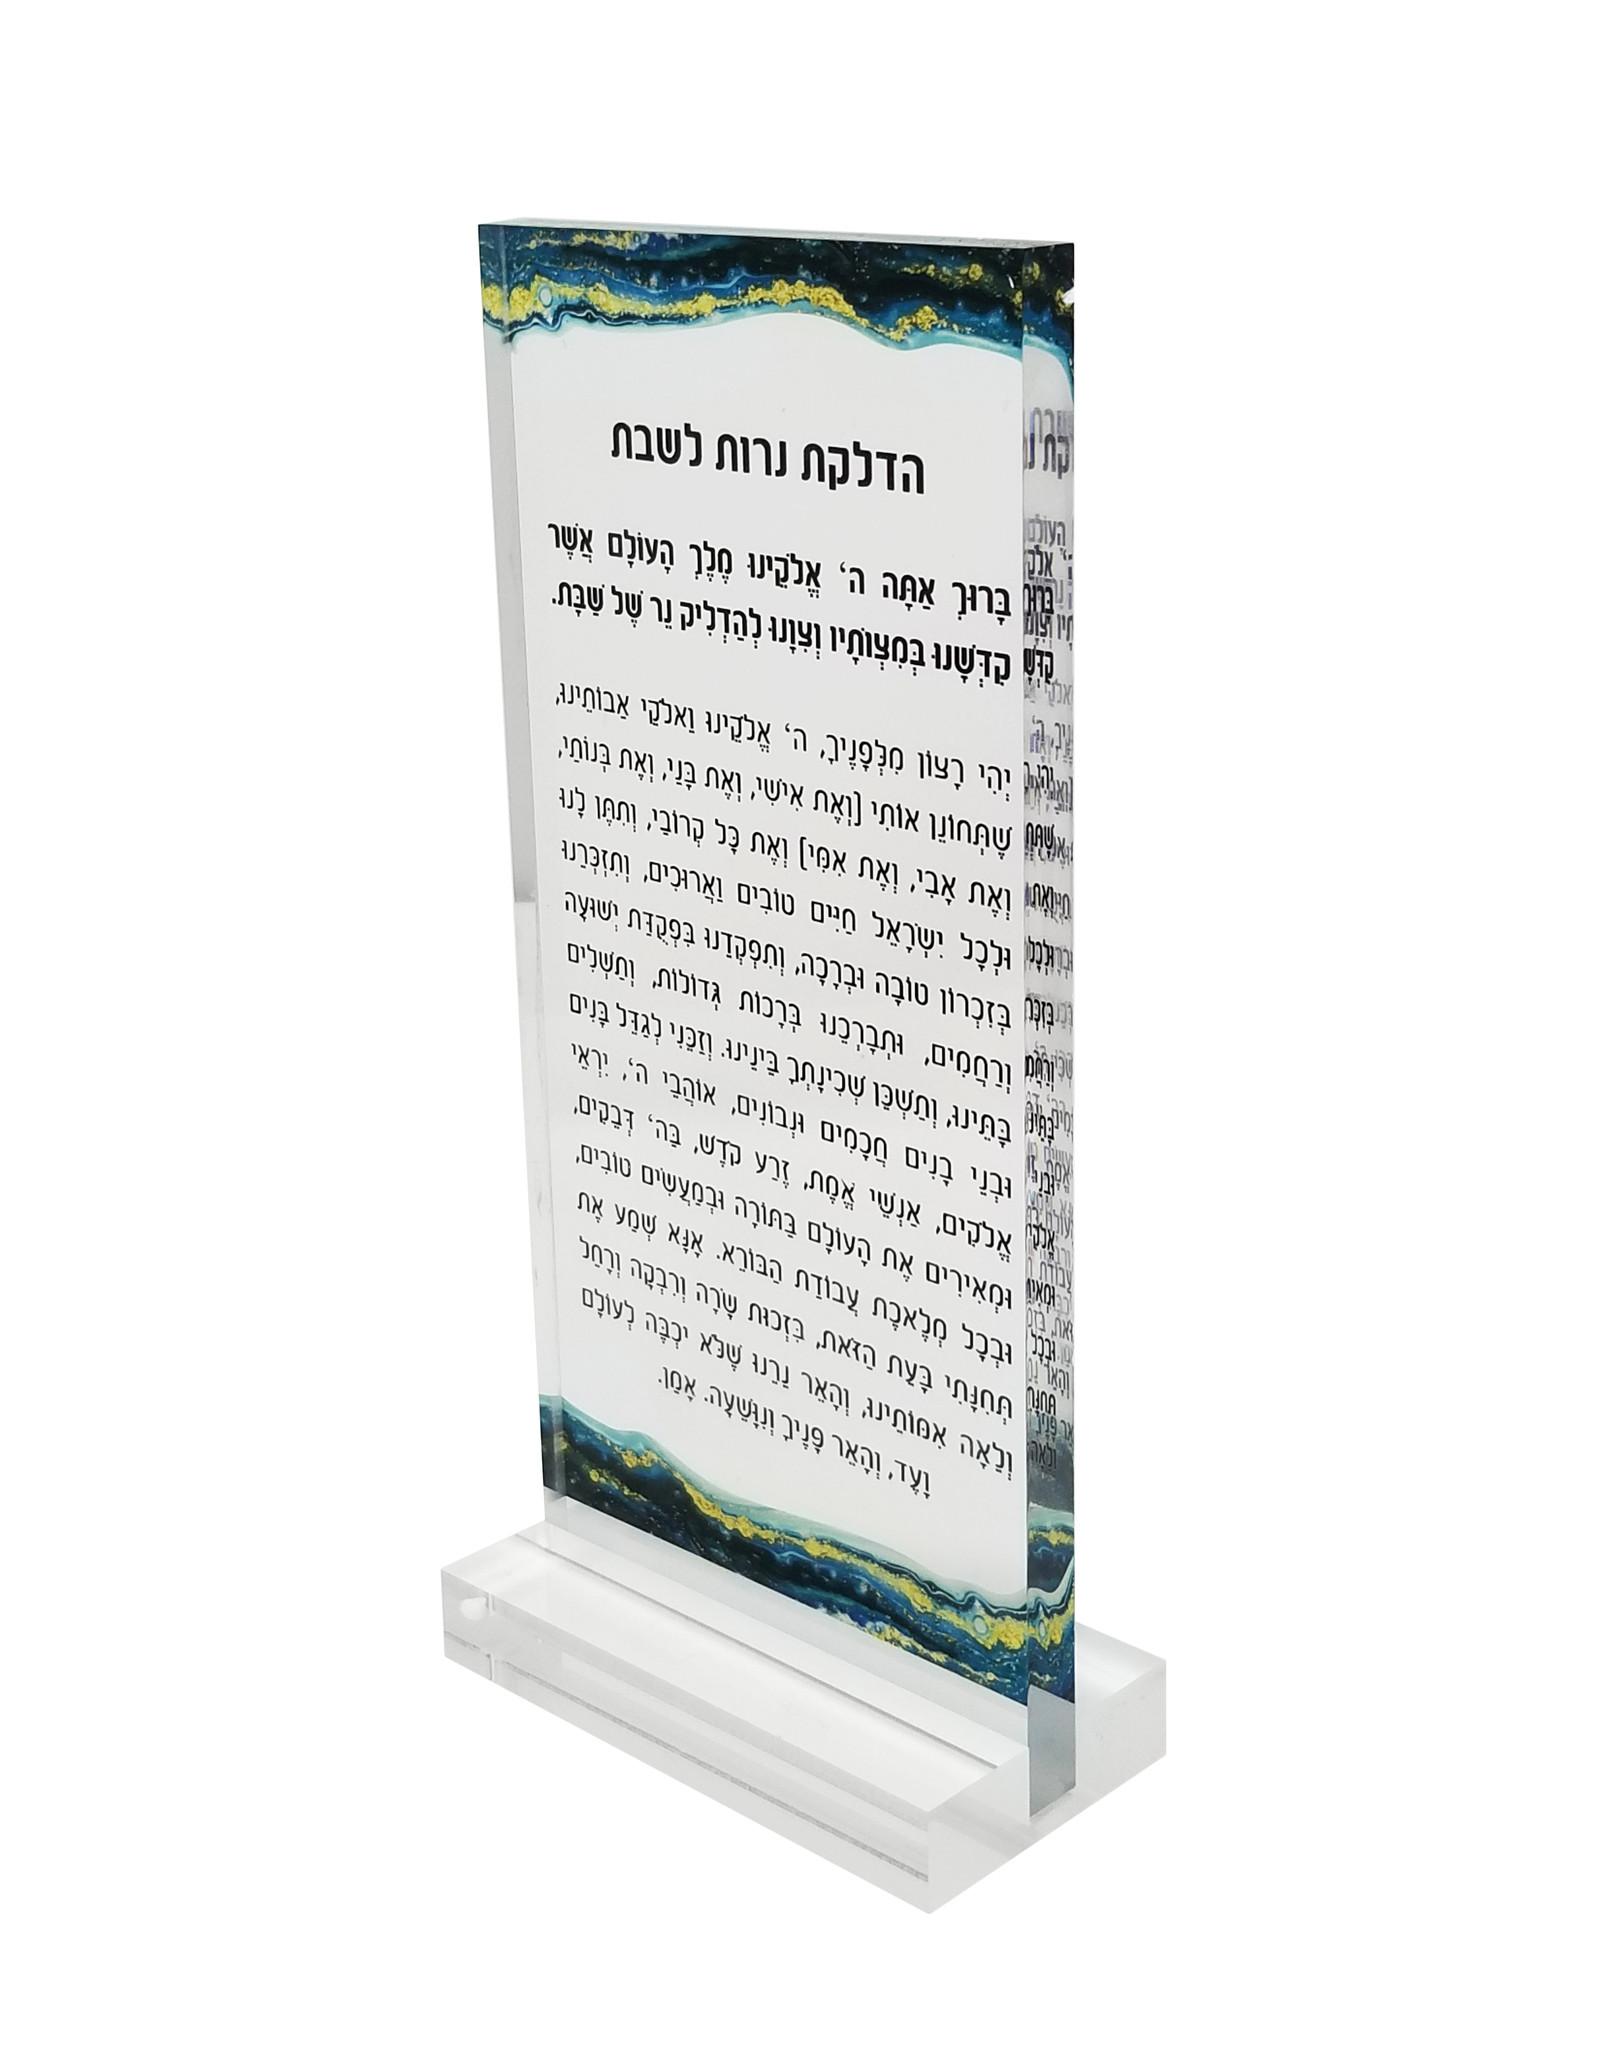 Presented Touch Acrylic Hadlakas Neiros shabbos Blue Marble